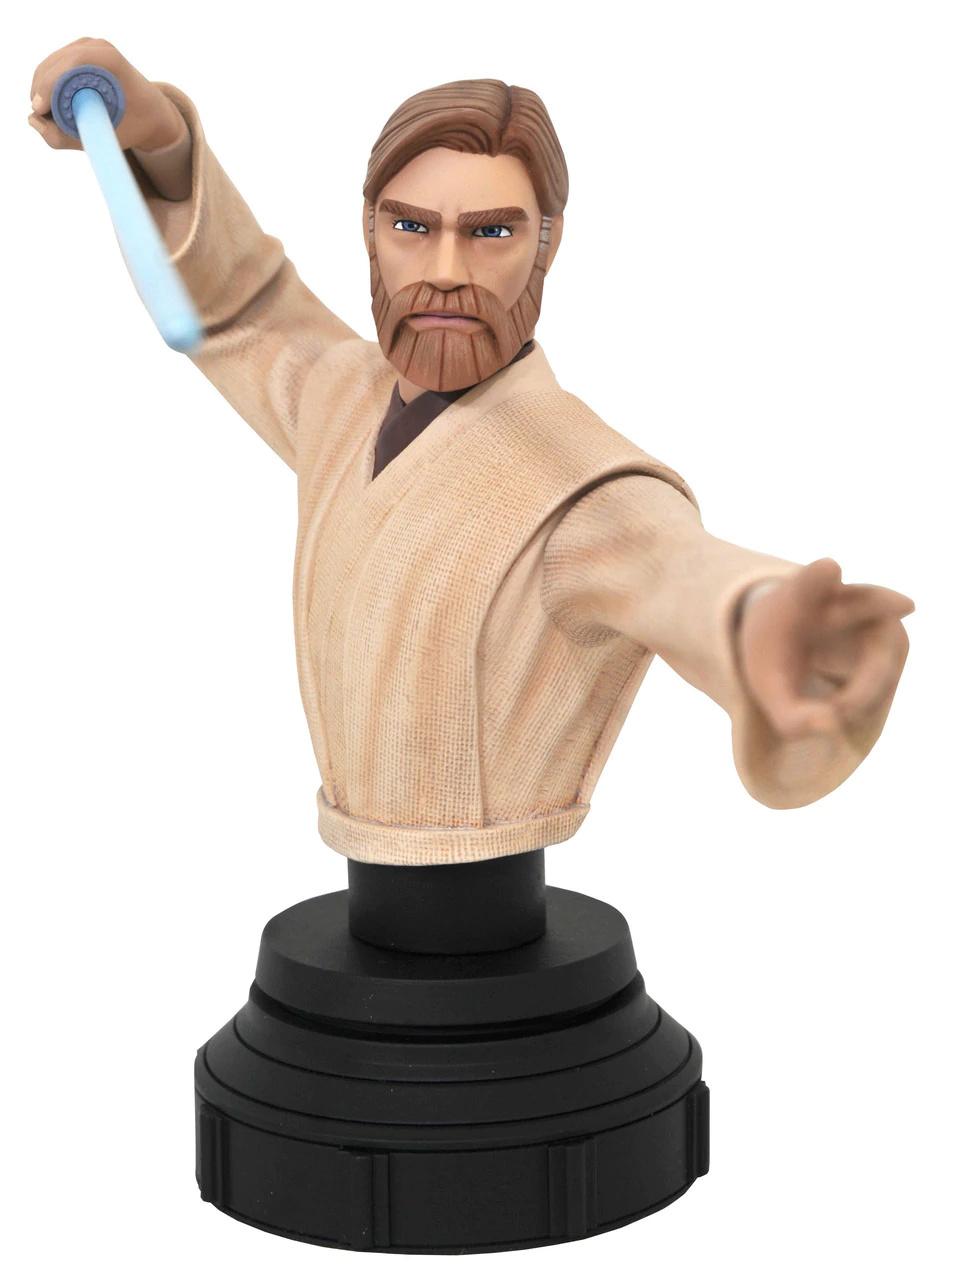 Star Wars Obi Wan Kenobi Bust - 1:7 Scale - Gentle Giant Starw124